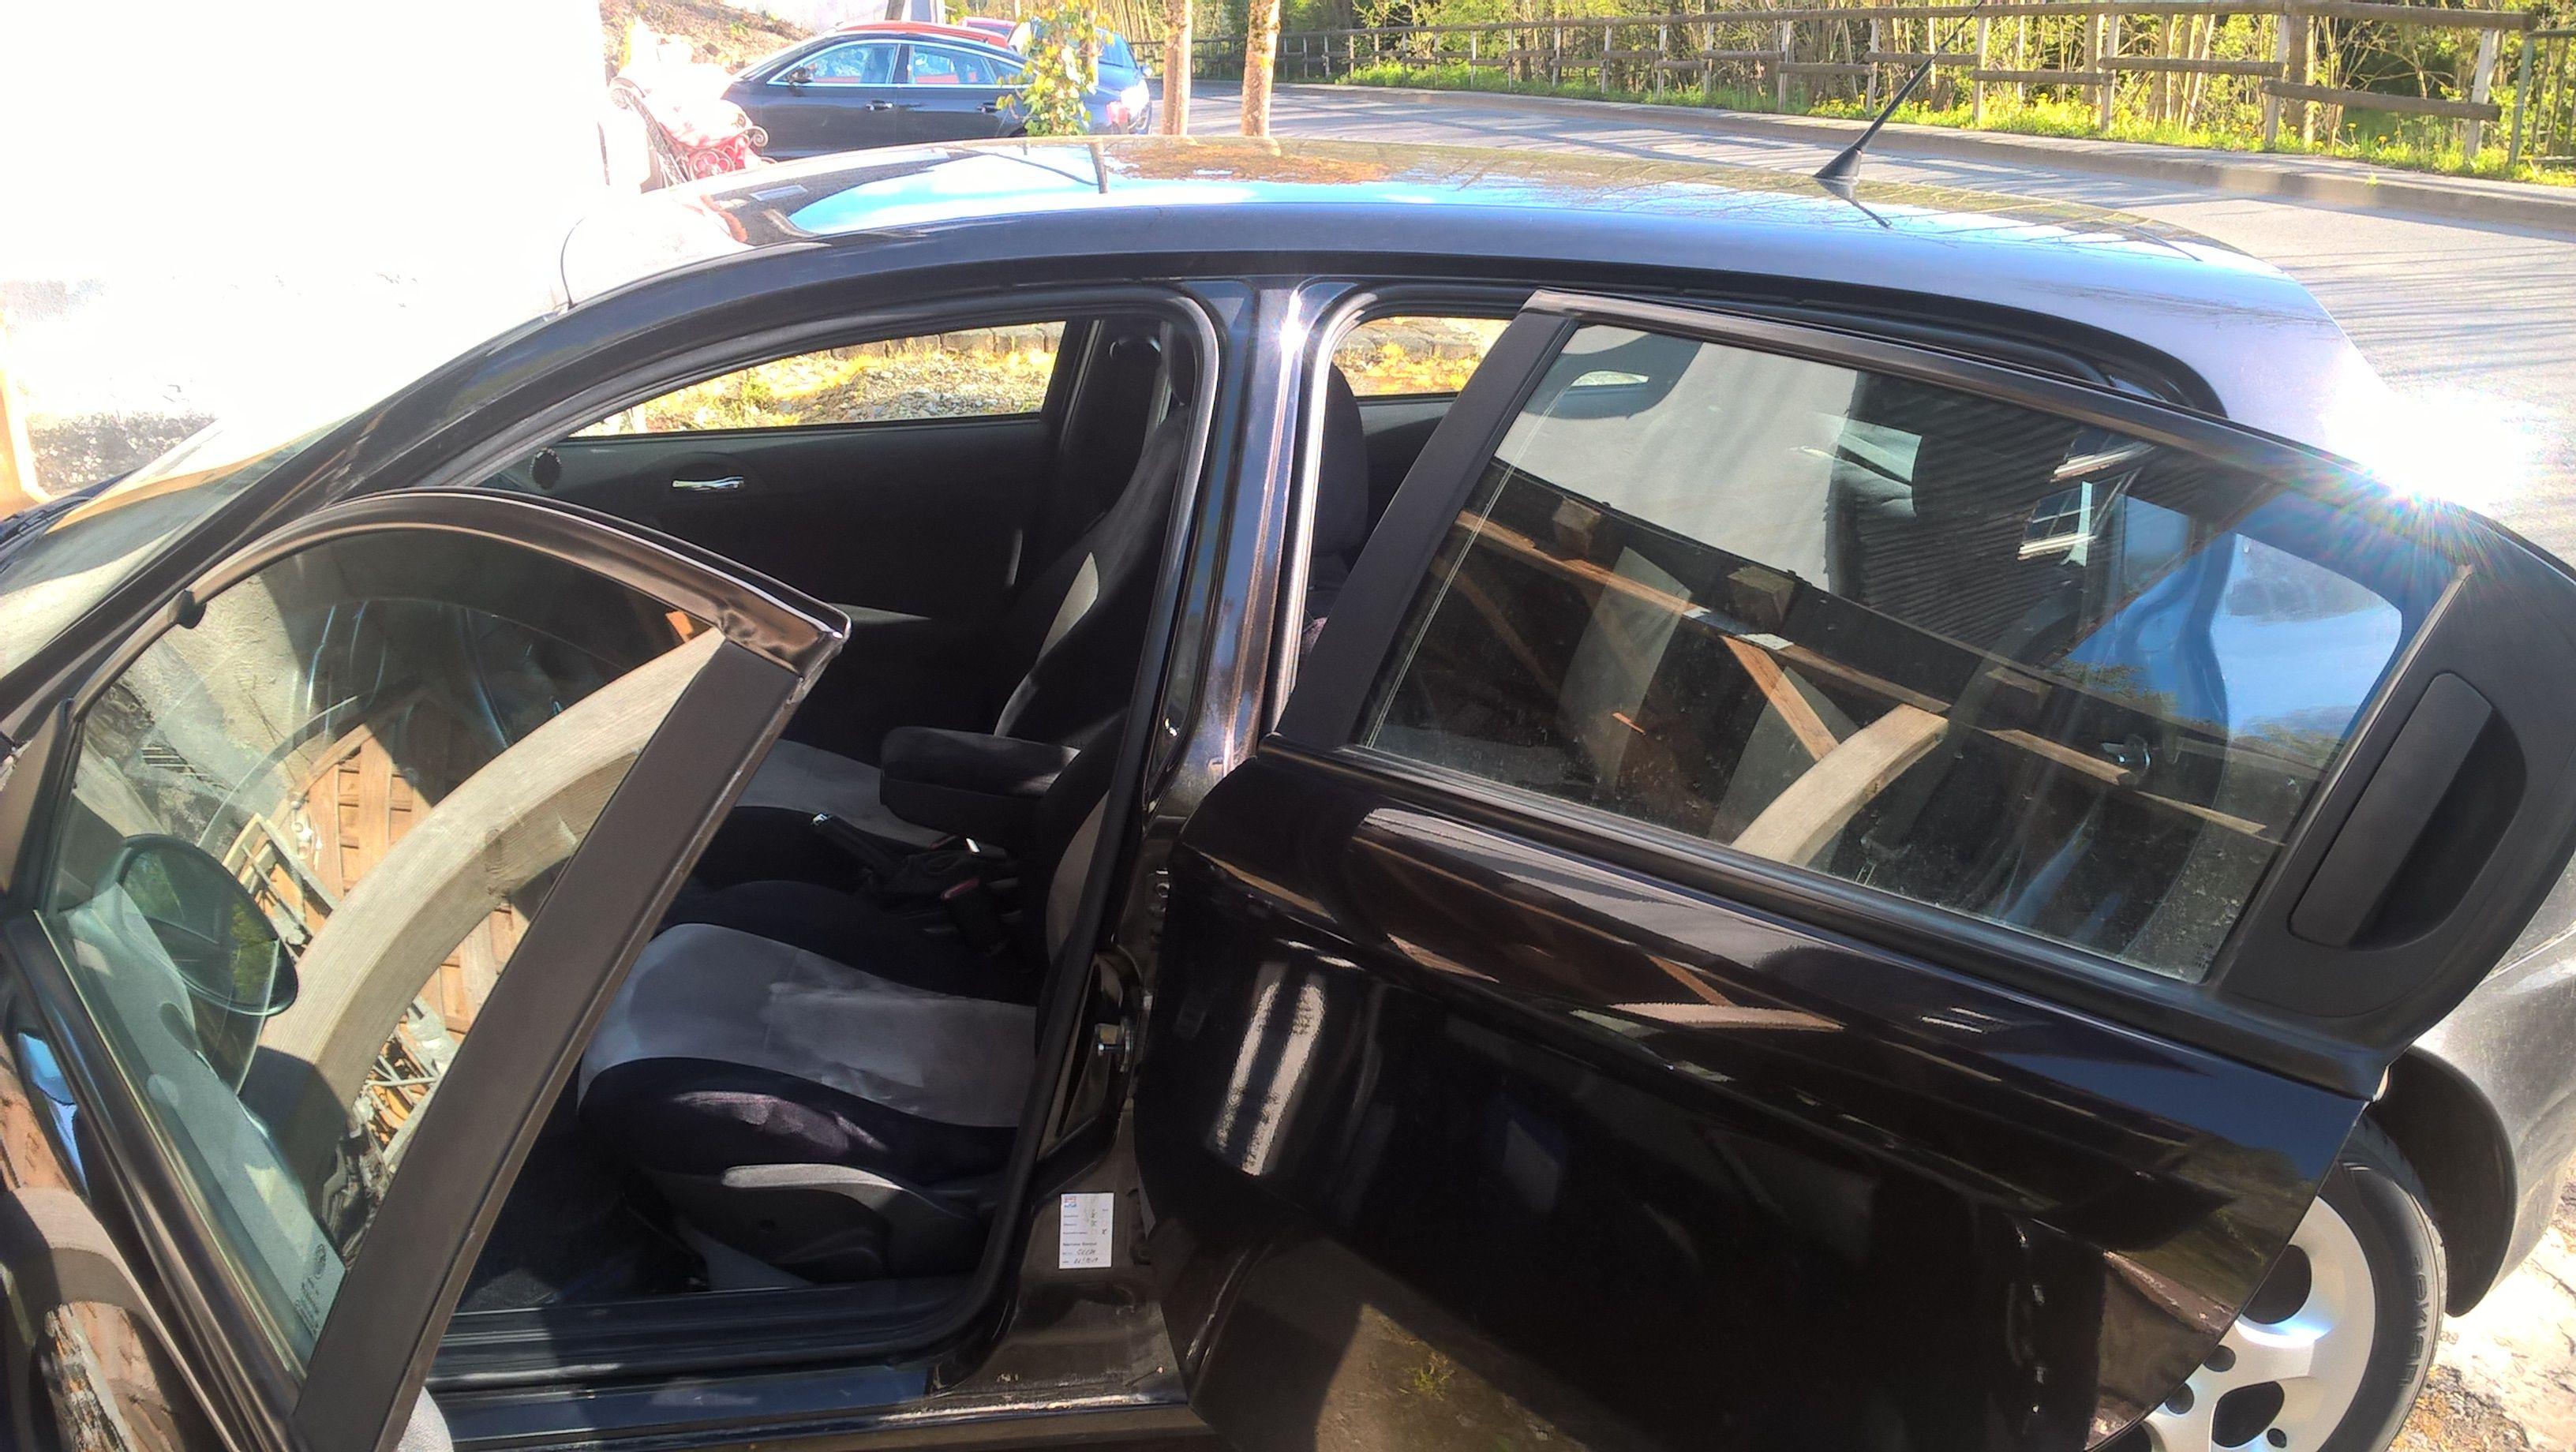 Alfa Romeo 147 Autositzbezüge nach Maß in der Alkantara gesamt Variante. Mittelstreifen Alkantara A.6 dunkelgrau und Seitenwangen + Rücken Alkantara A.9 schwarz #Alfa, #Tuning, #Sitzbezuege, #Tuning